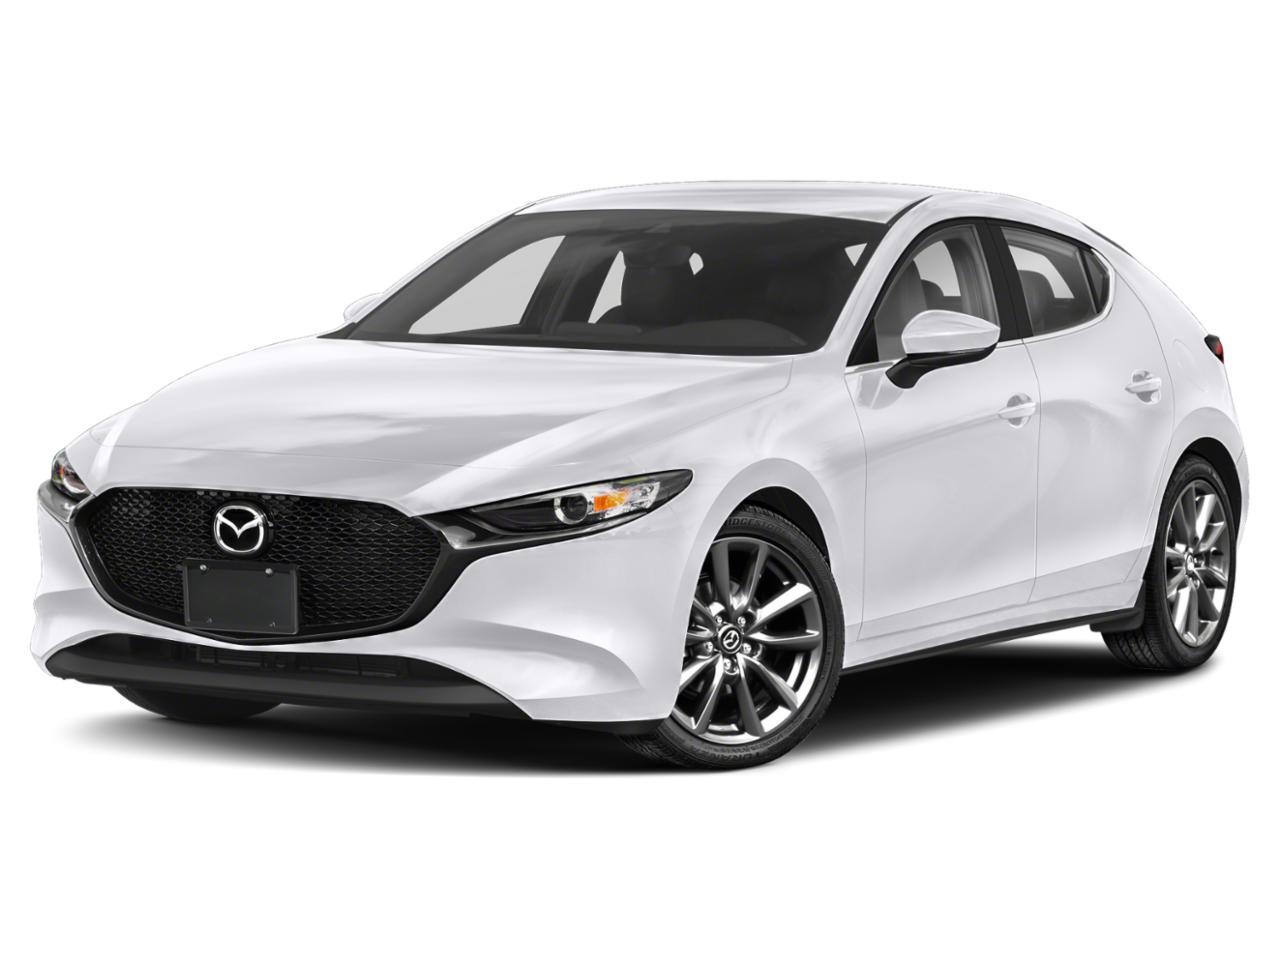 2021 Mazda3 Hatchback Vehicle Photo in Rockville, MD 20852